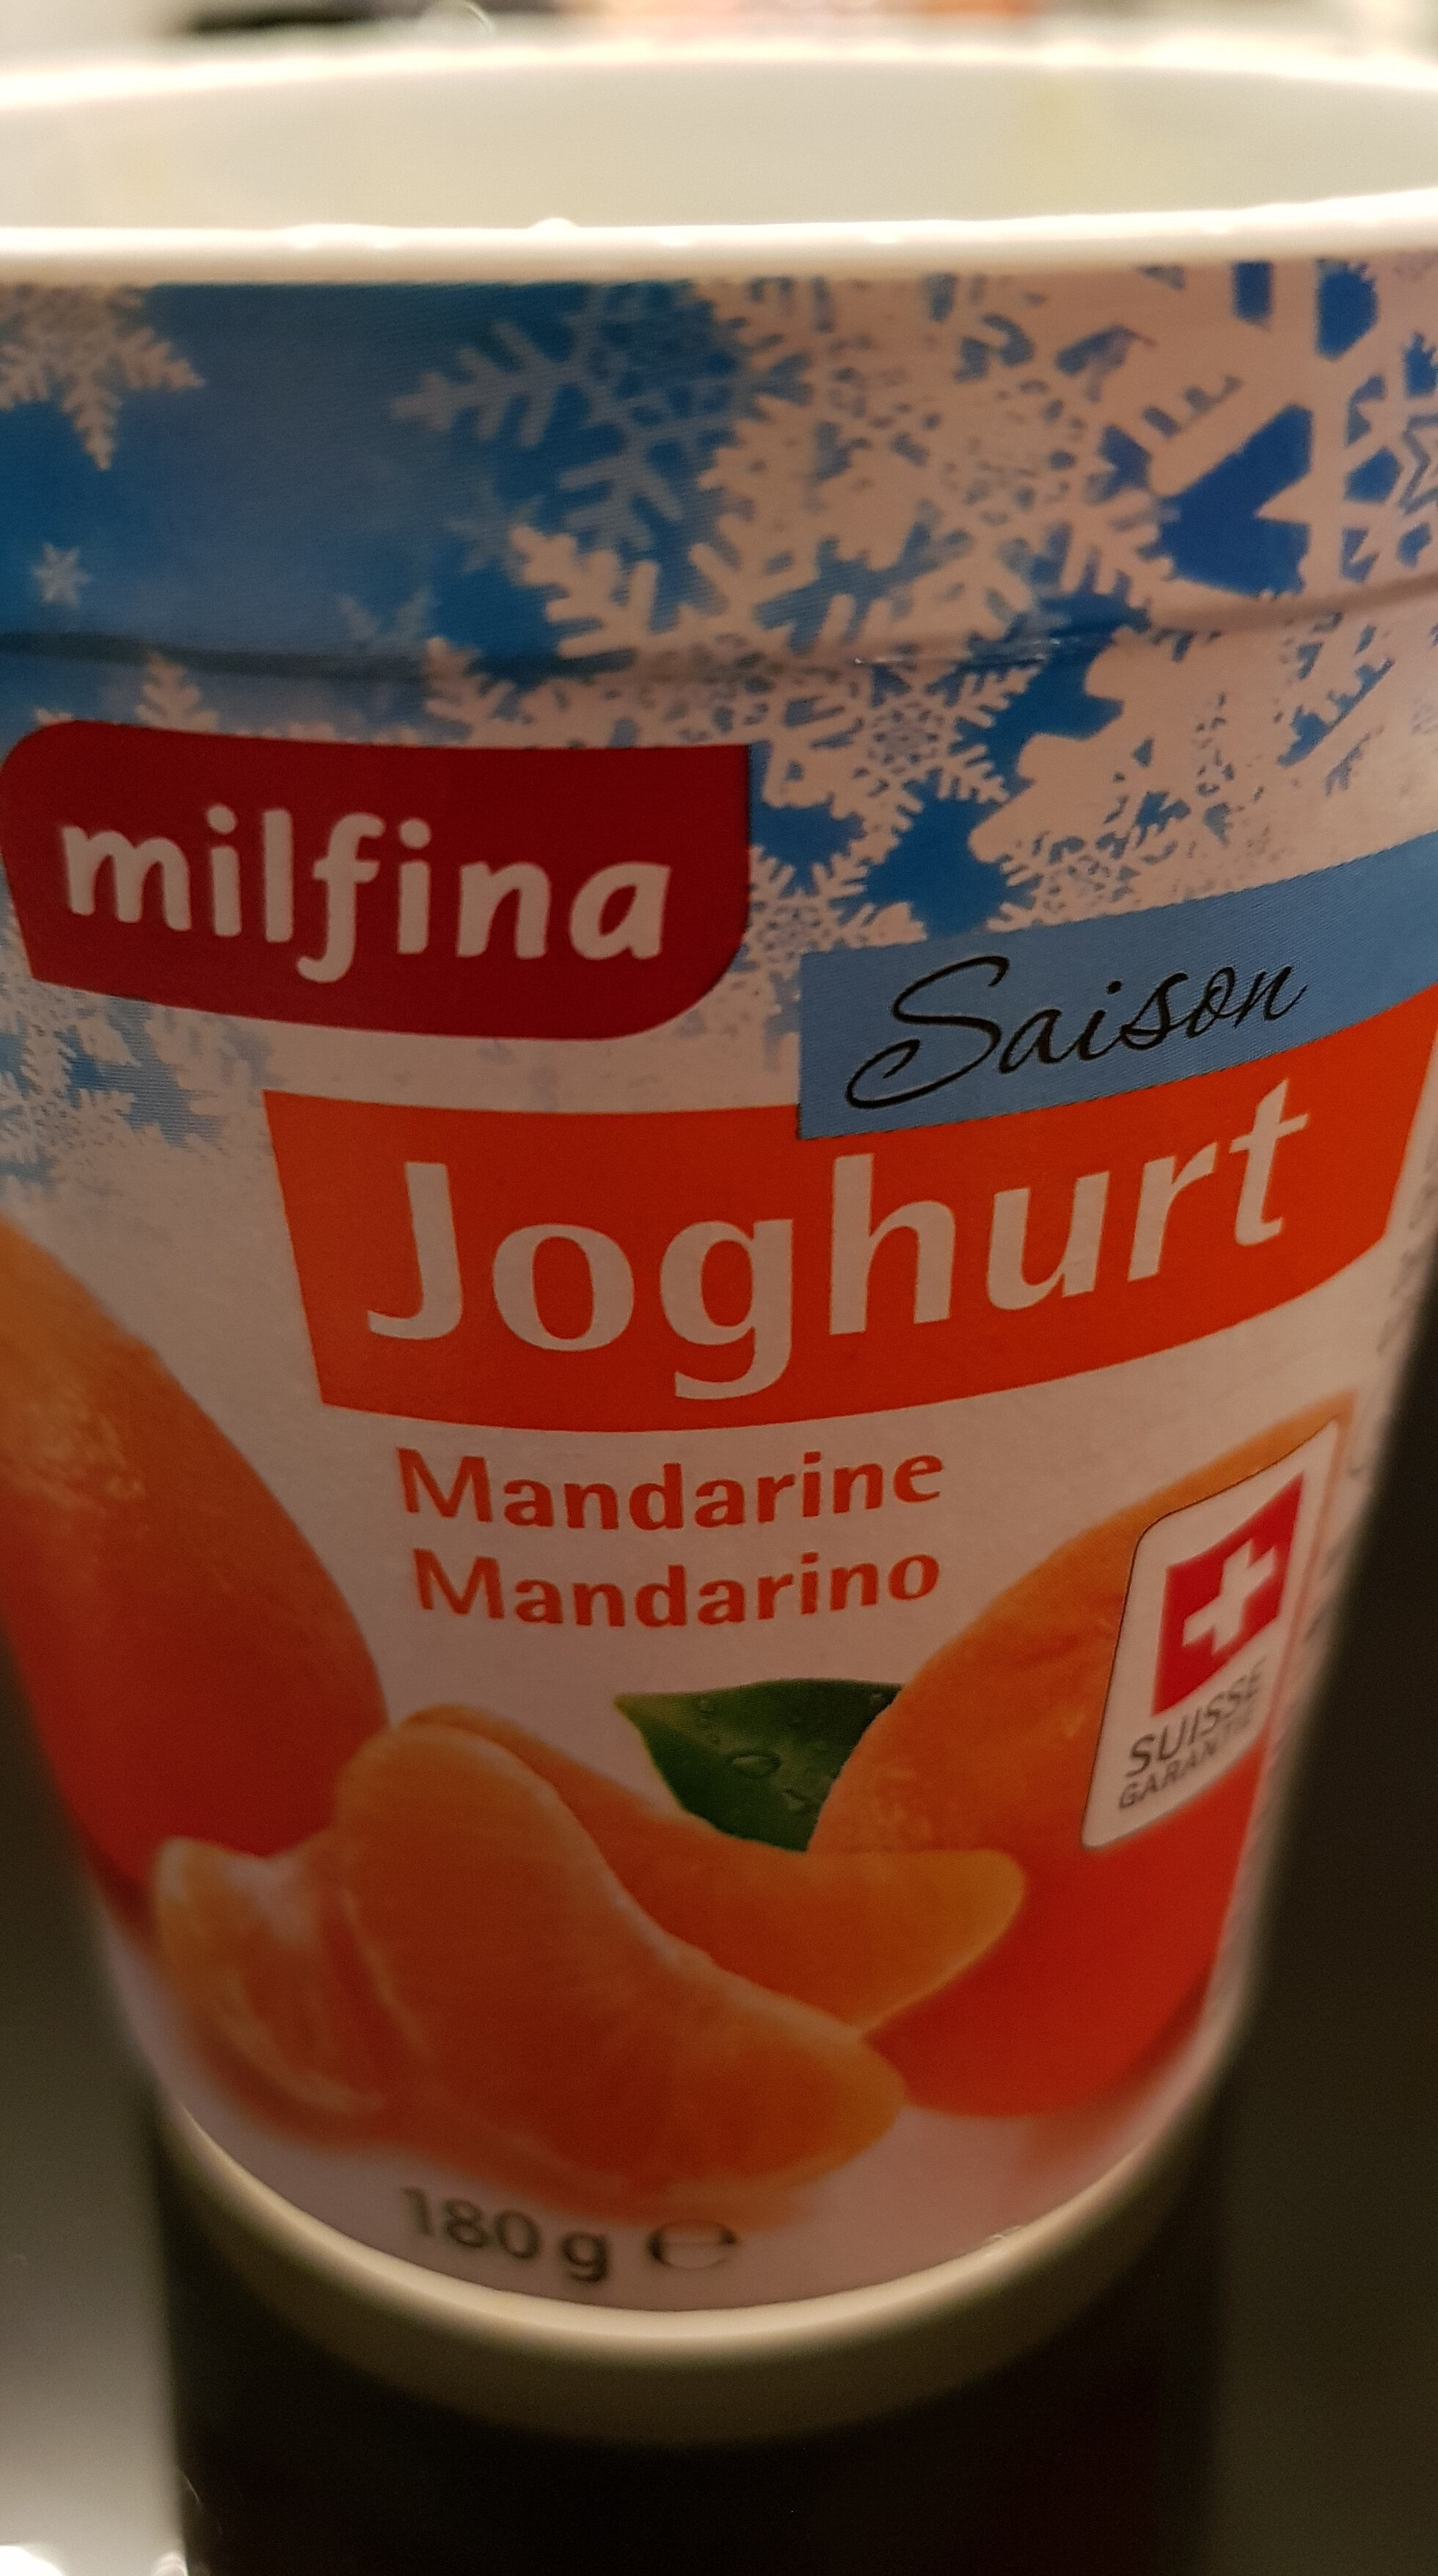 Joghurt Mandarine Mandarino - Product - fr